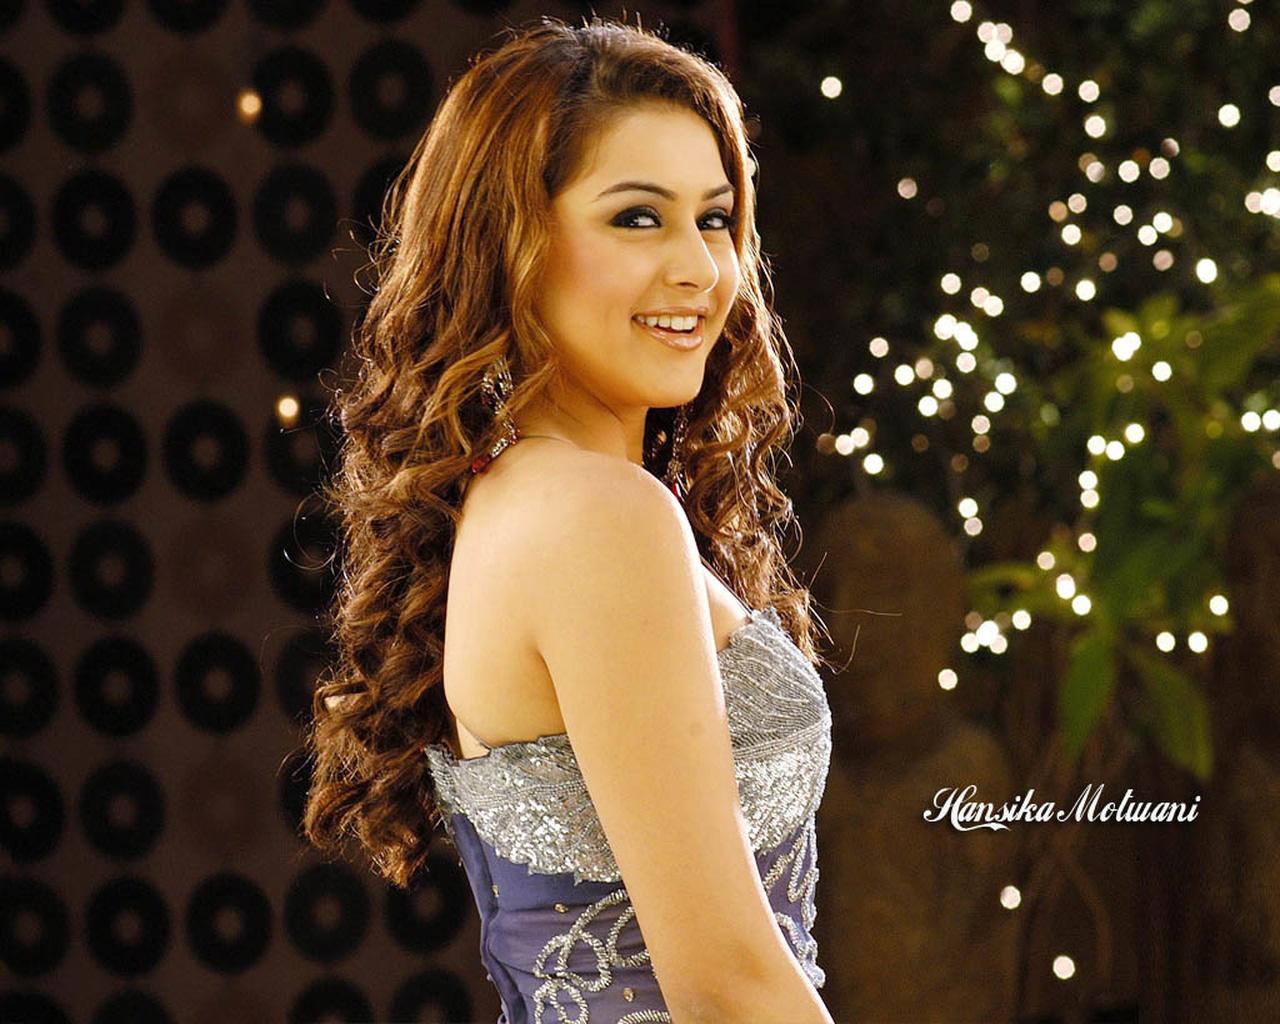 actresses hd wallpapers: hansika motwani hd wallpapers